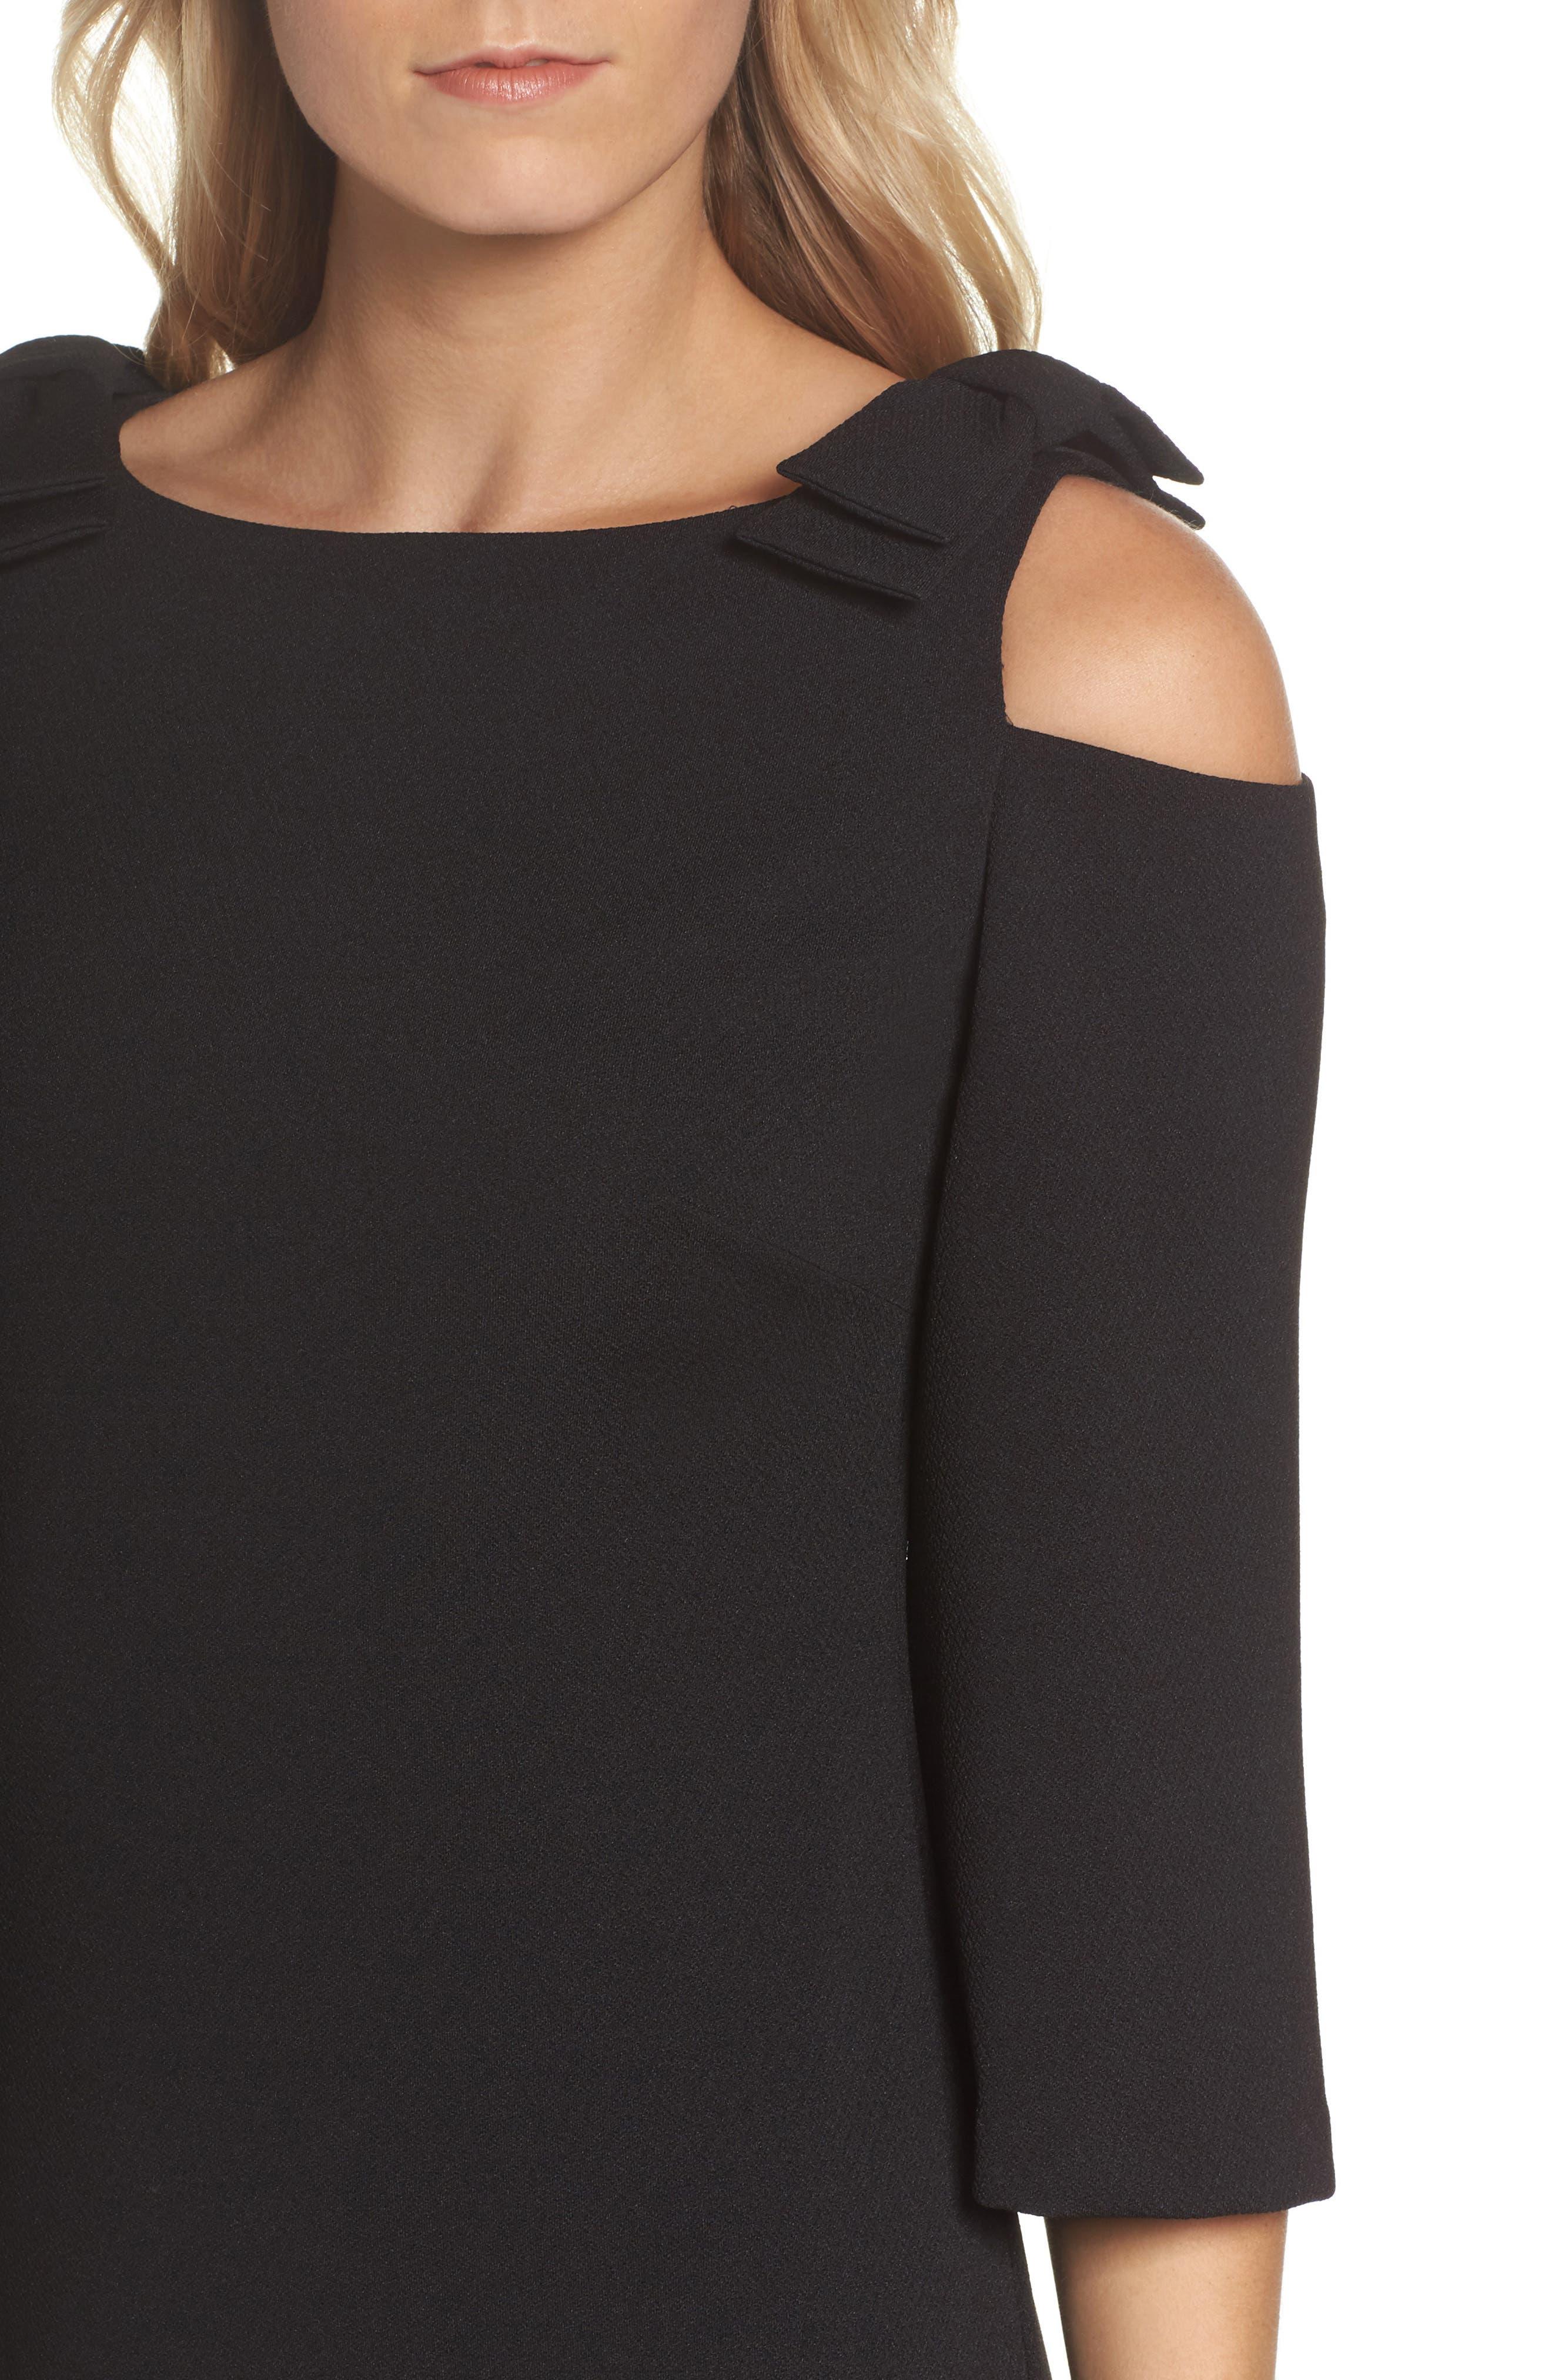 Aria Cold Shoulder Sheath Dress,                             Alternate thumbnail 4, color,                             001